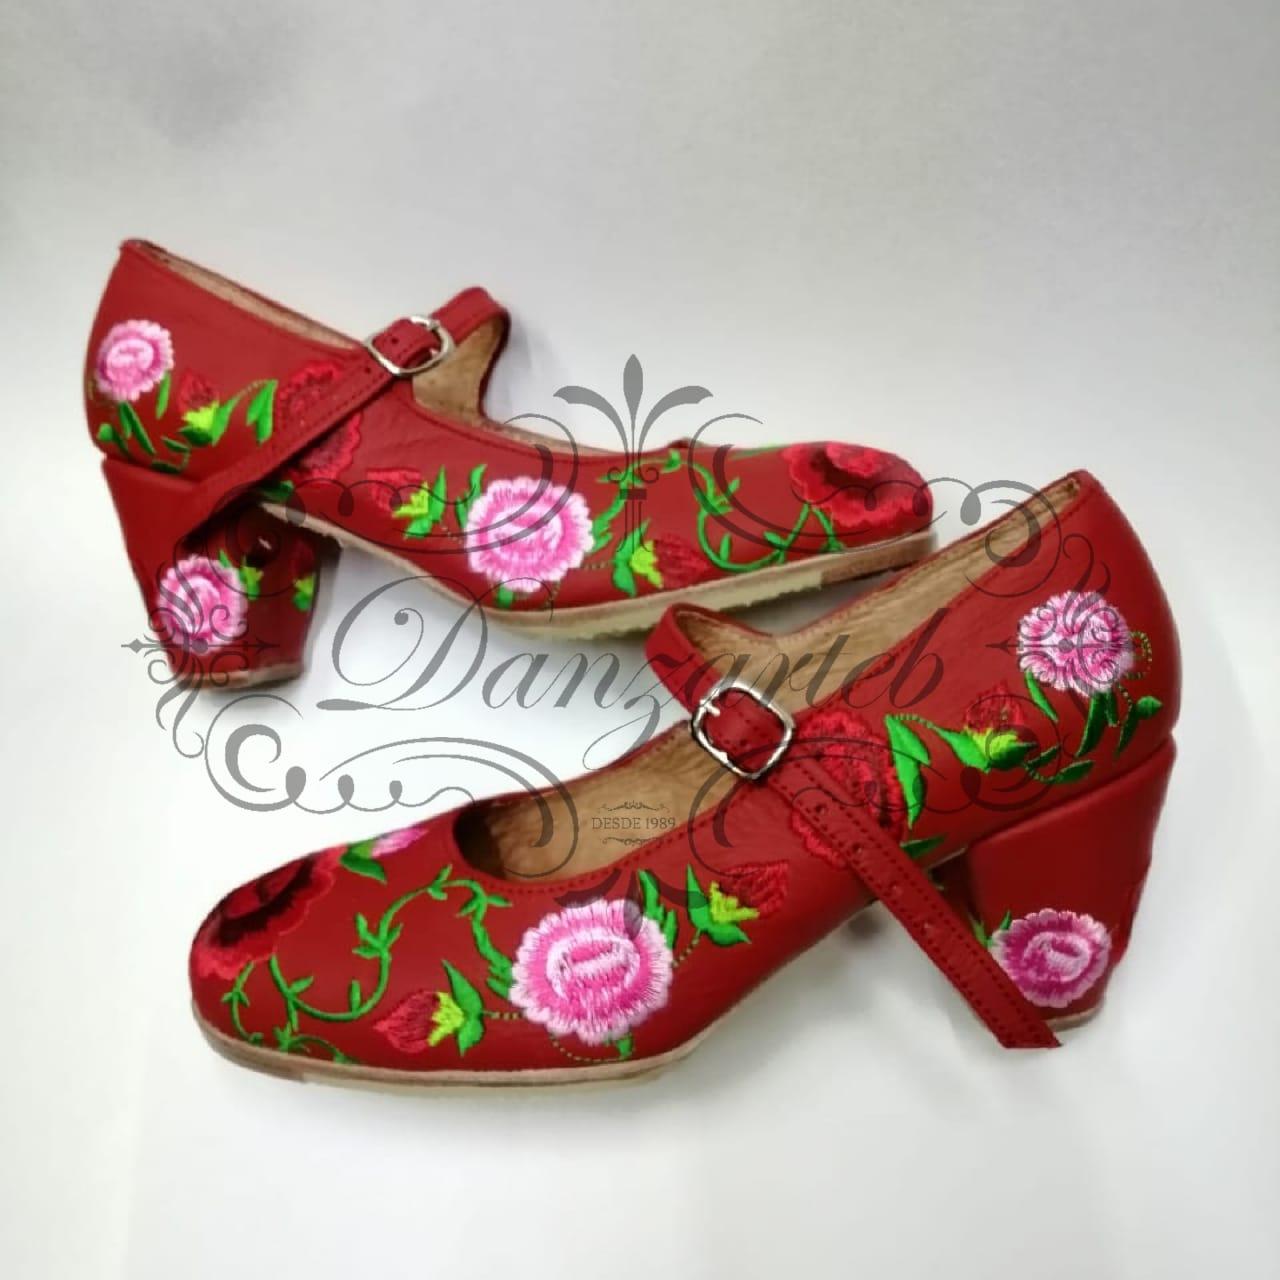 Danzarteb Shoes — I Love Folklorico, LLC